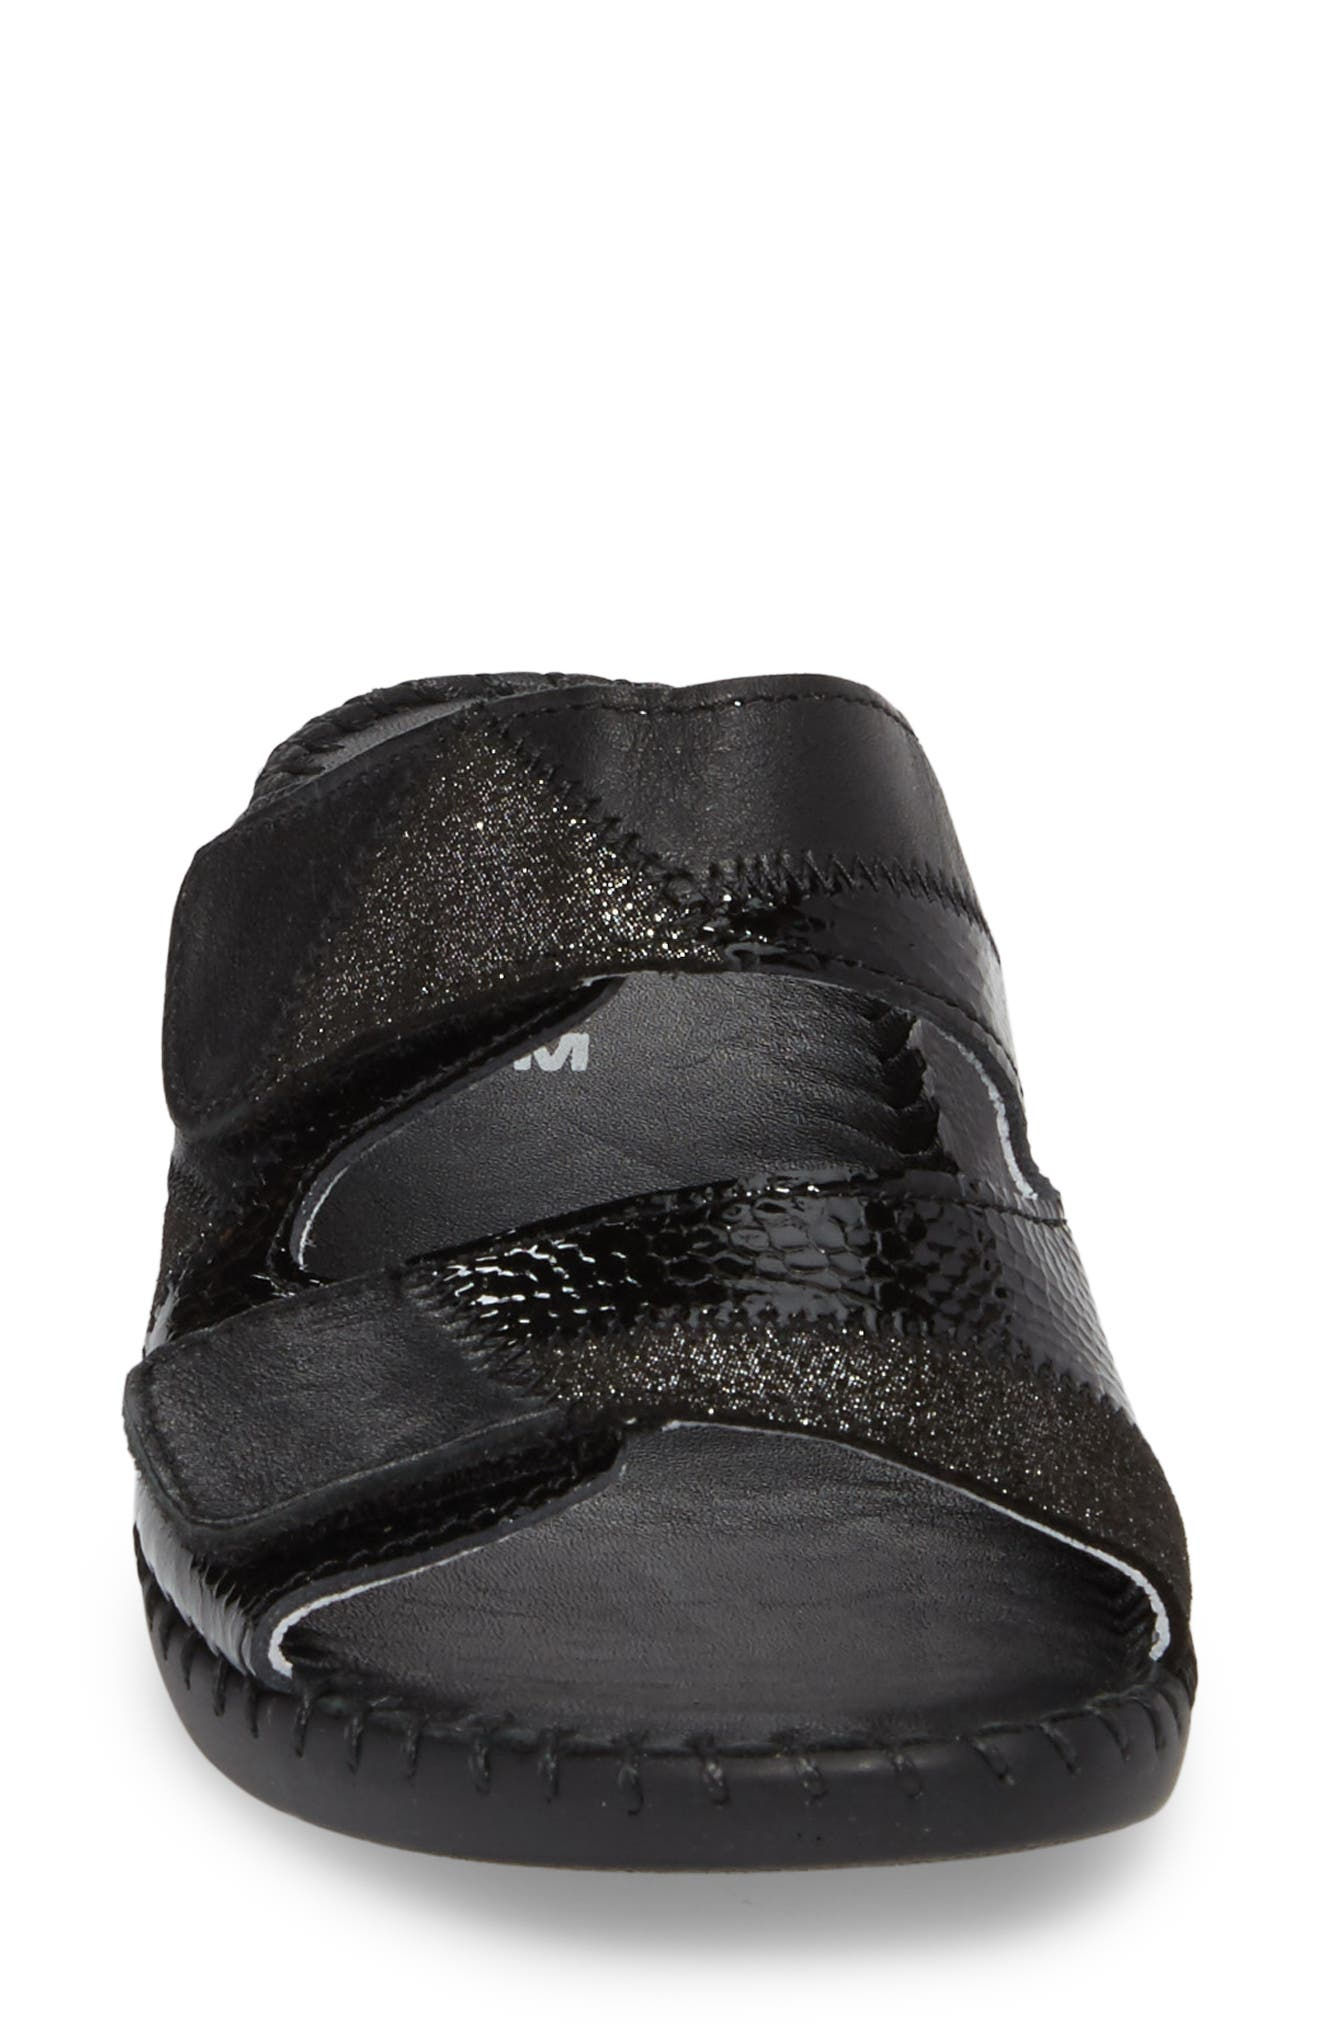 Flex Slide Sandal,                             Alternate thumbnail 4, color,                             BLACK LEATHER